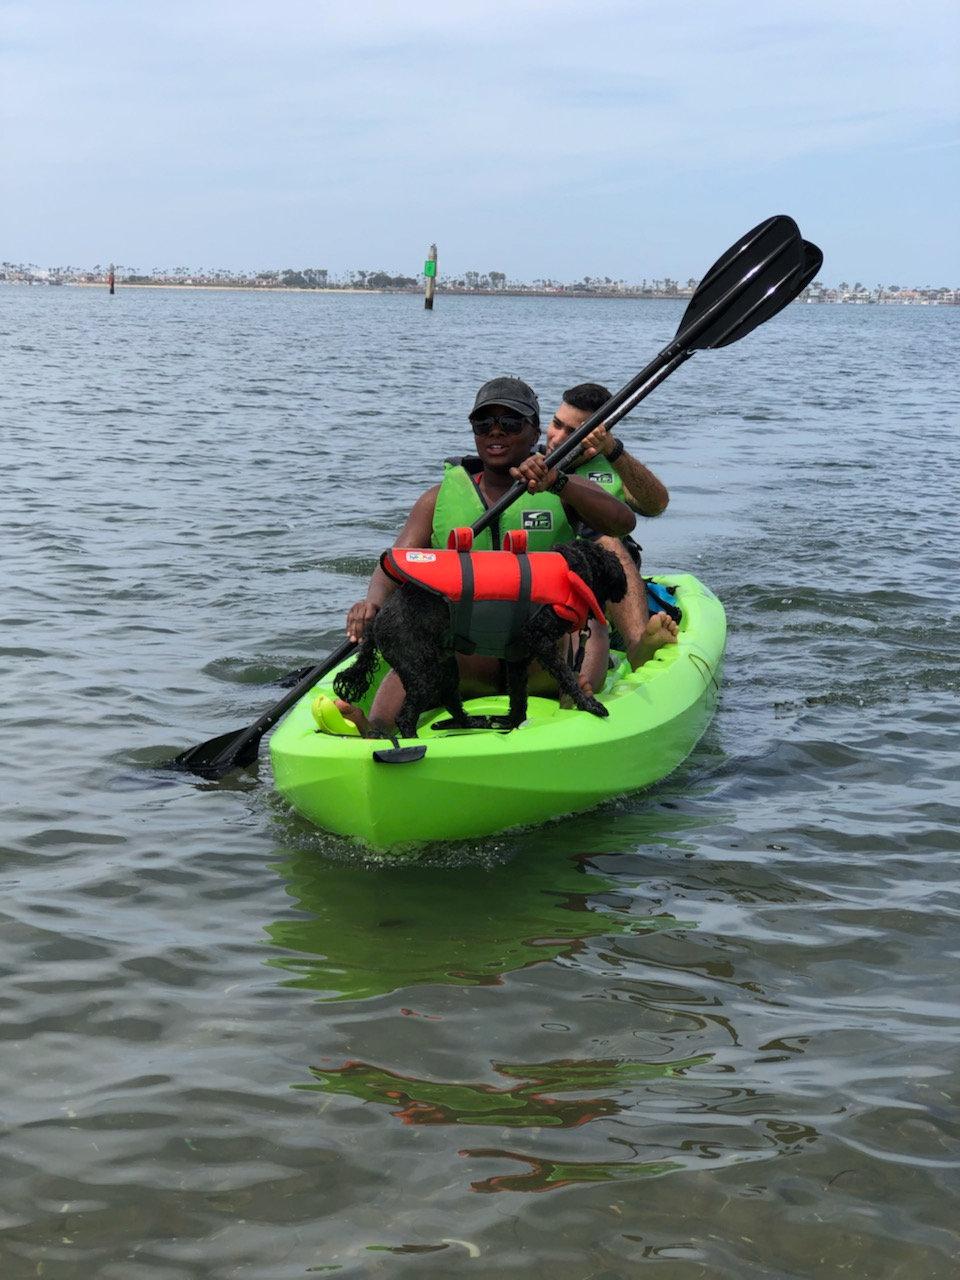 Tandem Kayak (2 Person) 2 Hr Rental